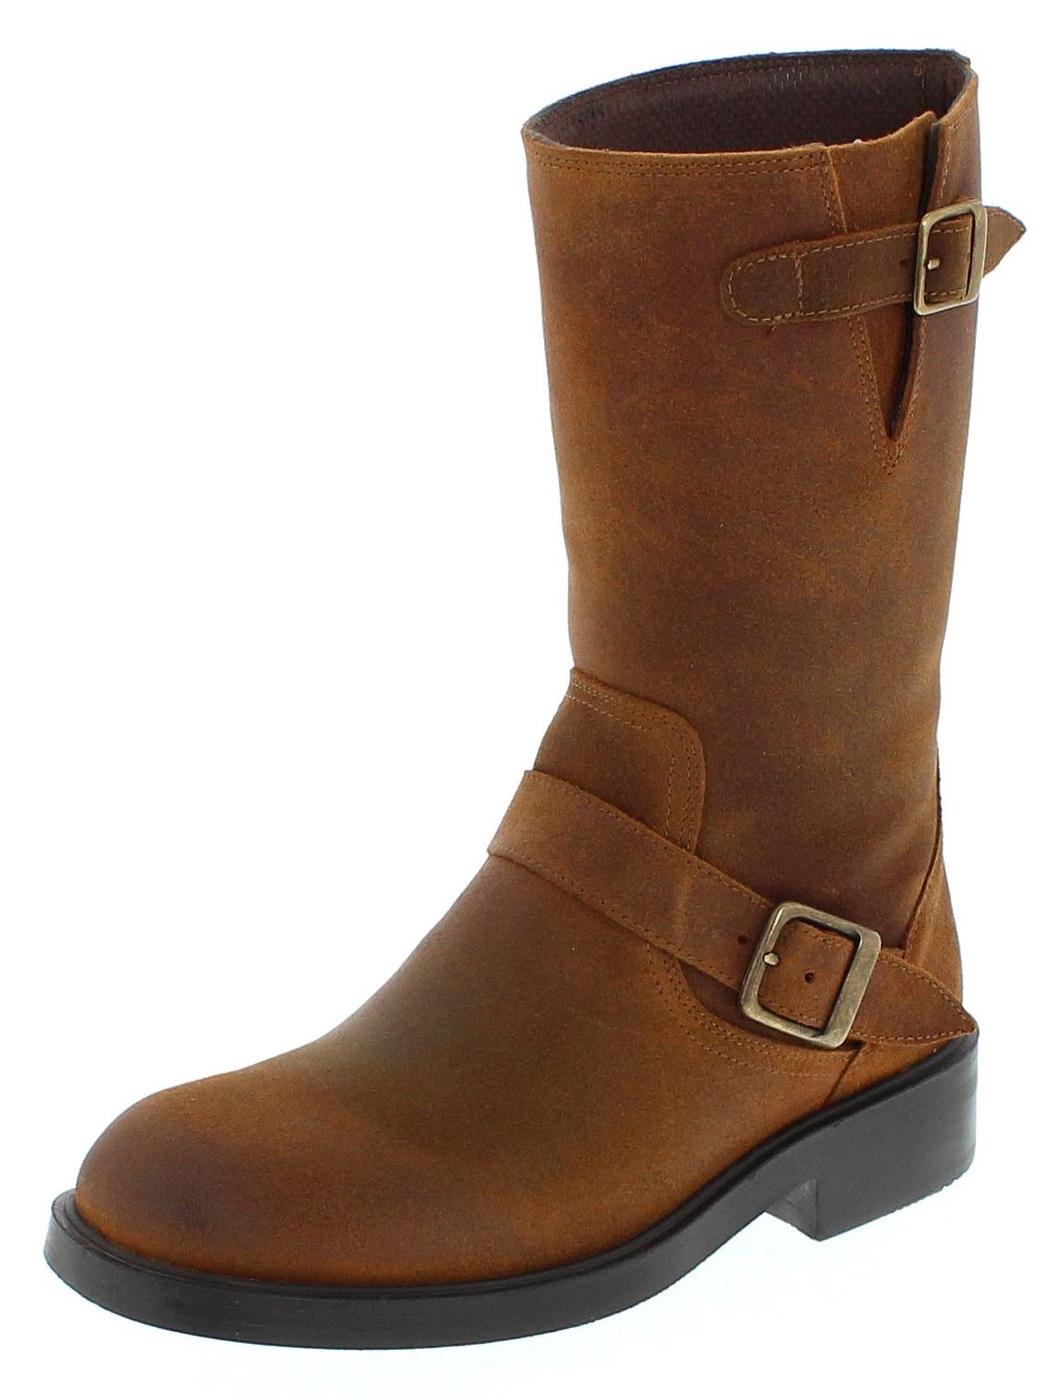 FB Fashion Boots BU2006 Whisky Engineer Stiefel ohne Stahlkappe - braun